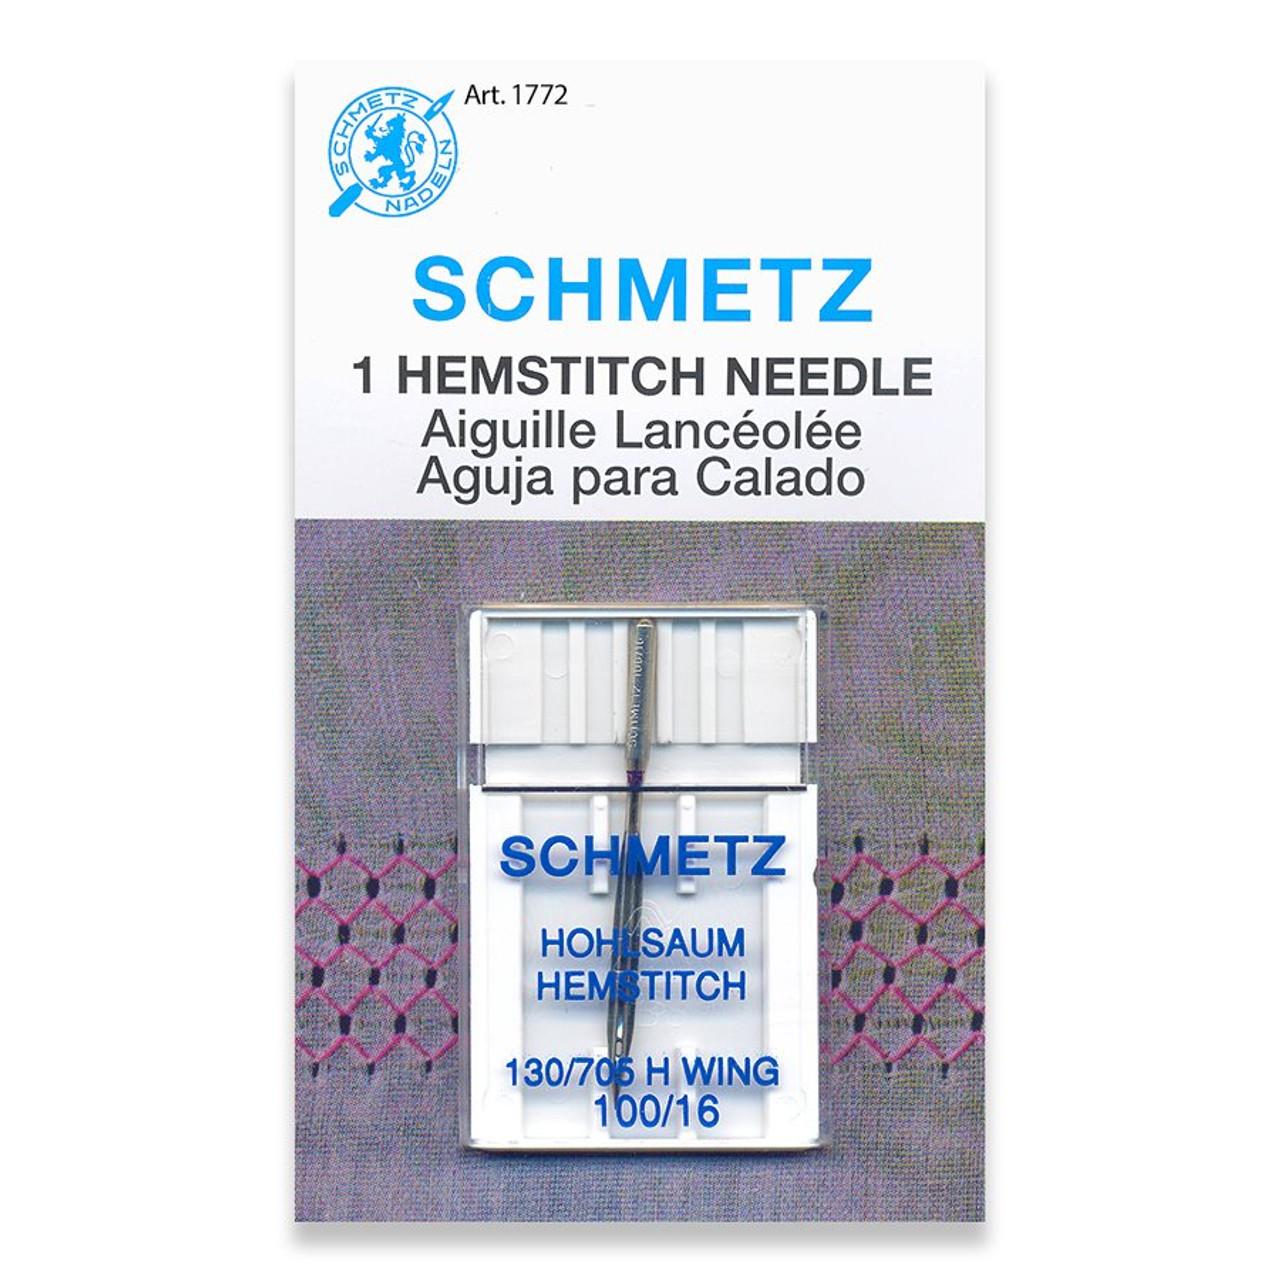 Schmetz Needle Hemstitch Wing